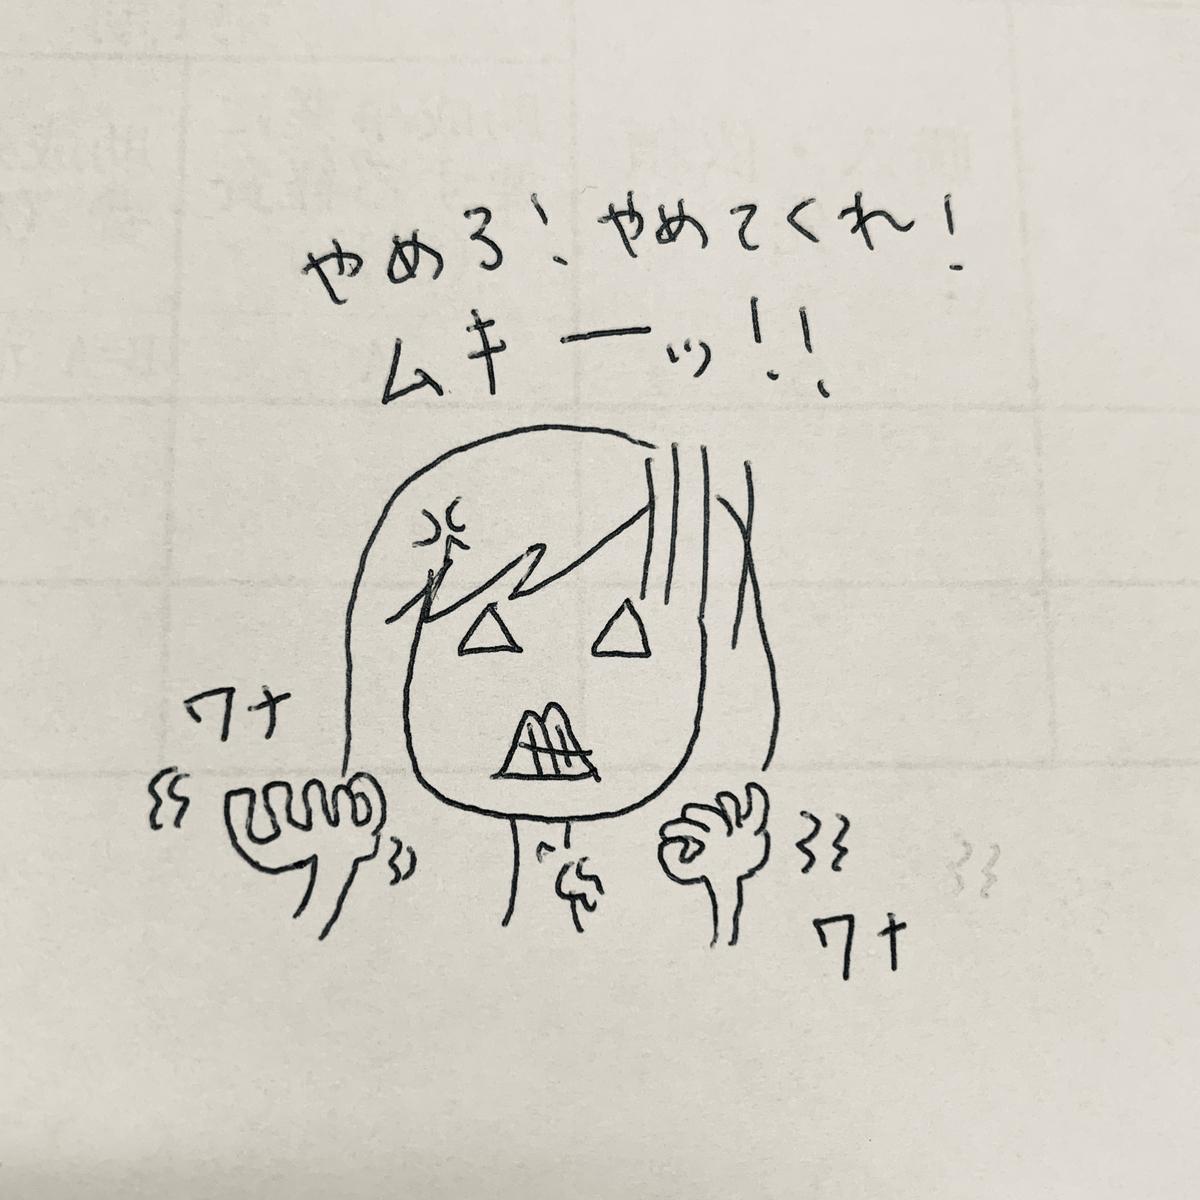 f:id:nananan0:20190326154314j:plain